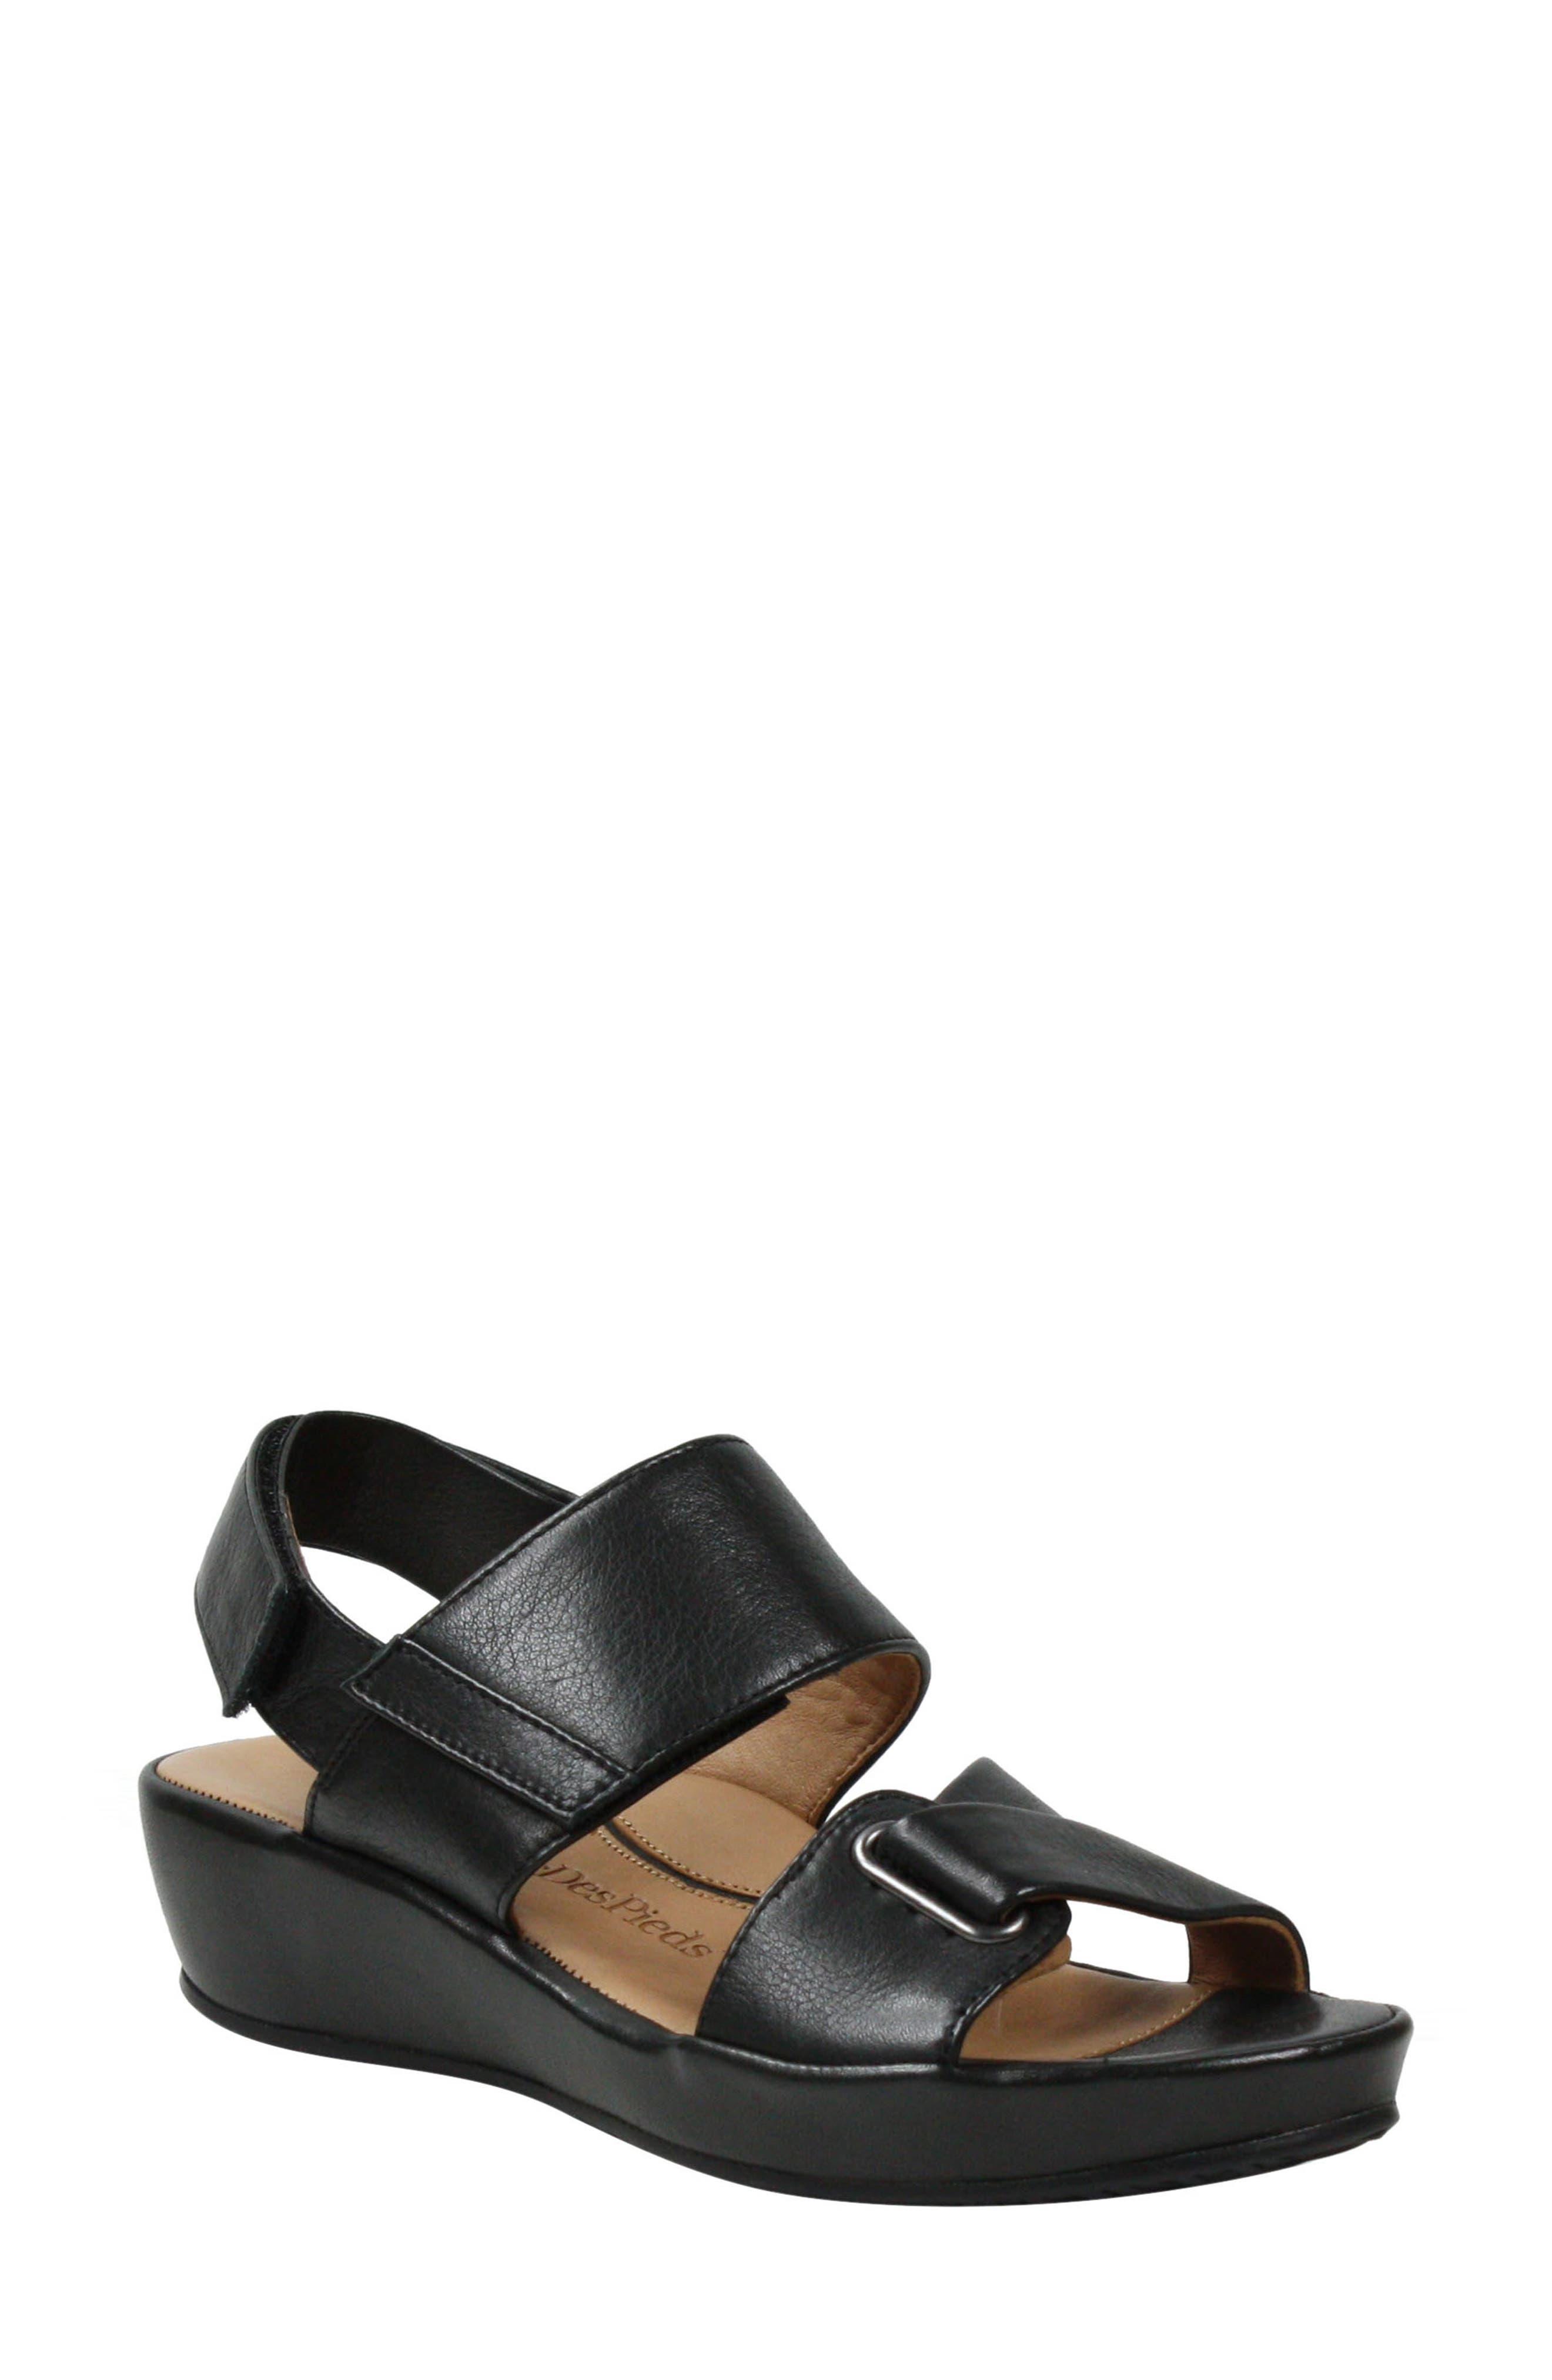 Calantha Wedge Sandal